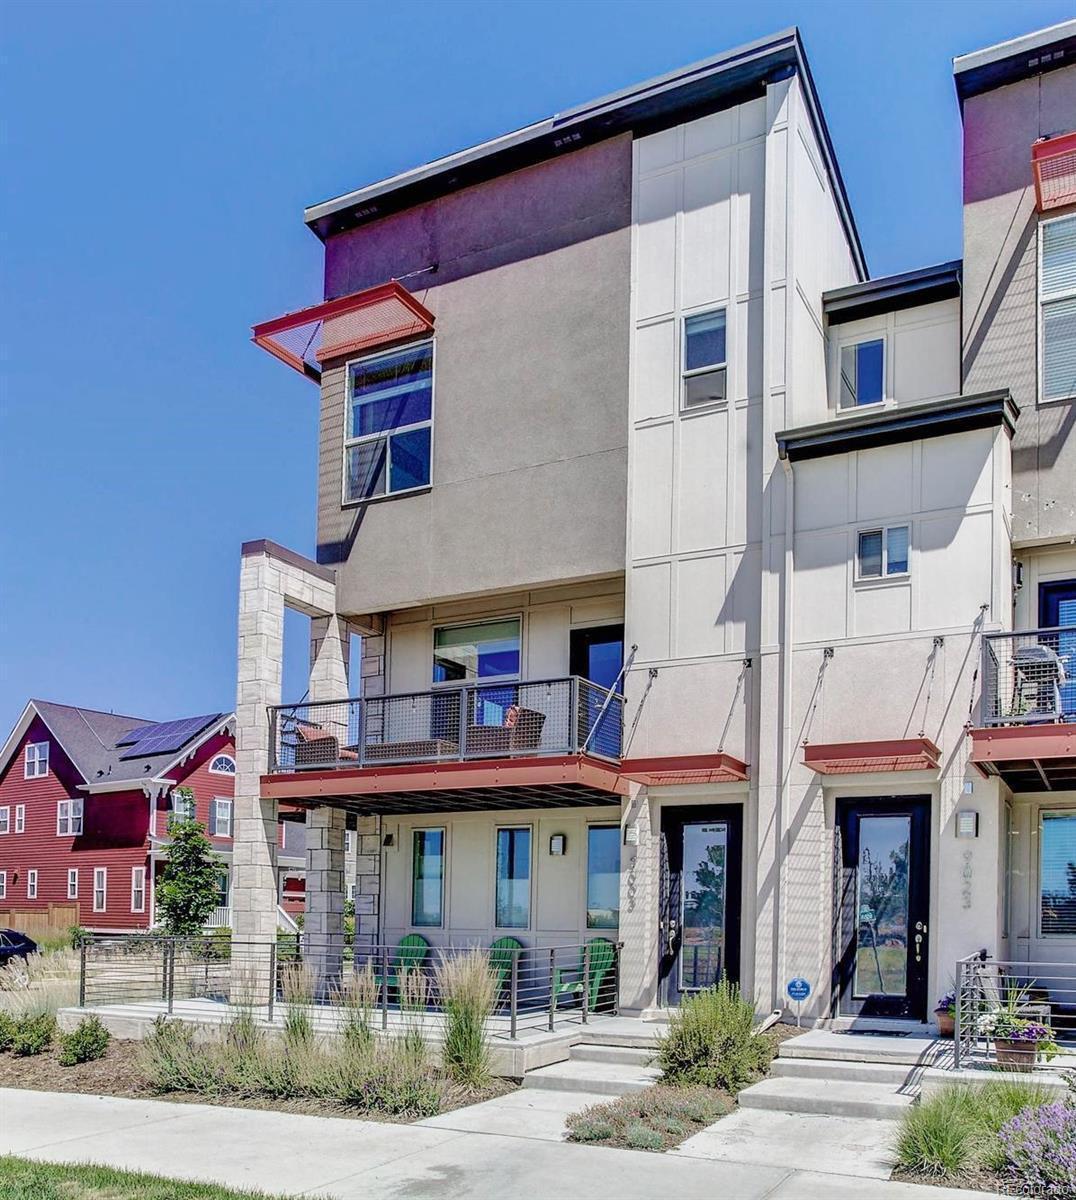 9003 E Northfield Blvd, Denver, CO 80238 | MLS# 2912790 ...